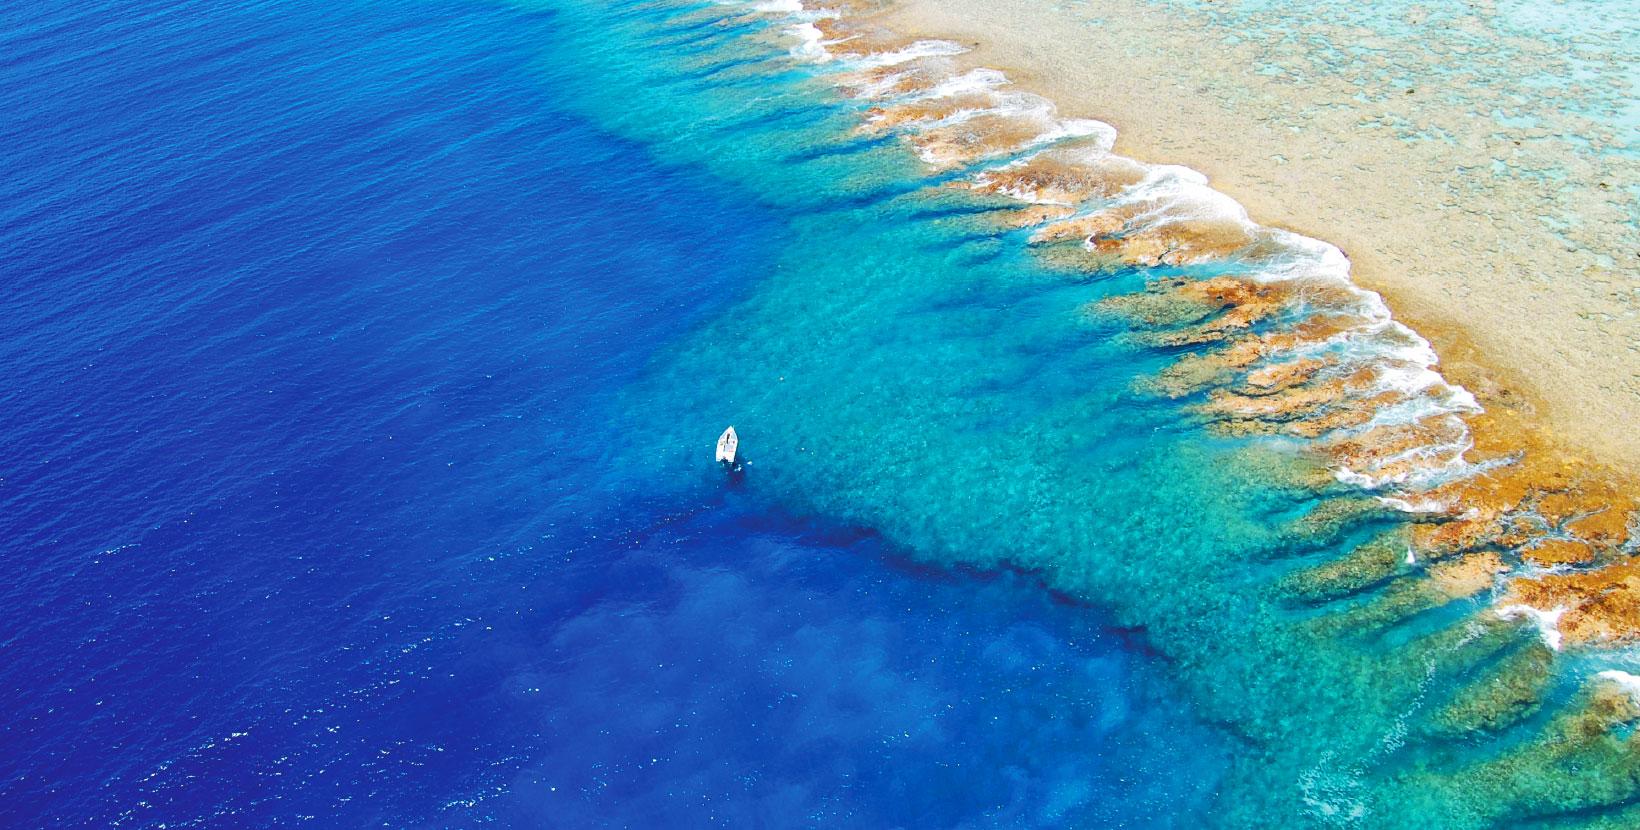 Tetaroa Island, The Brando